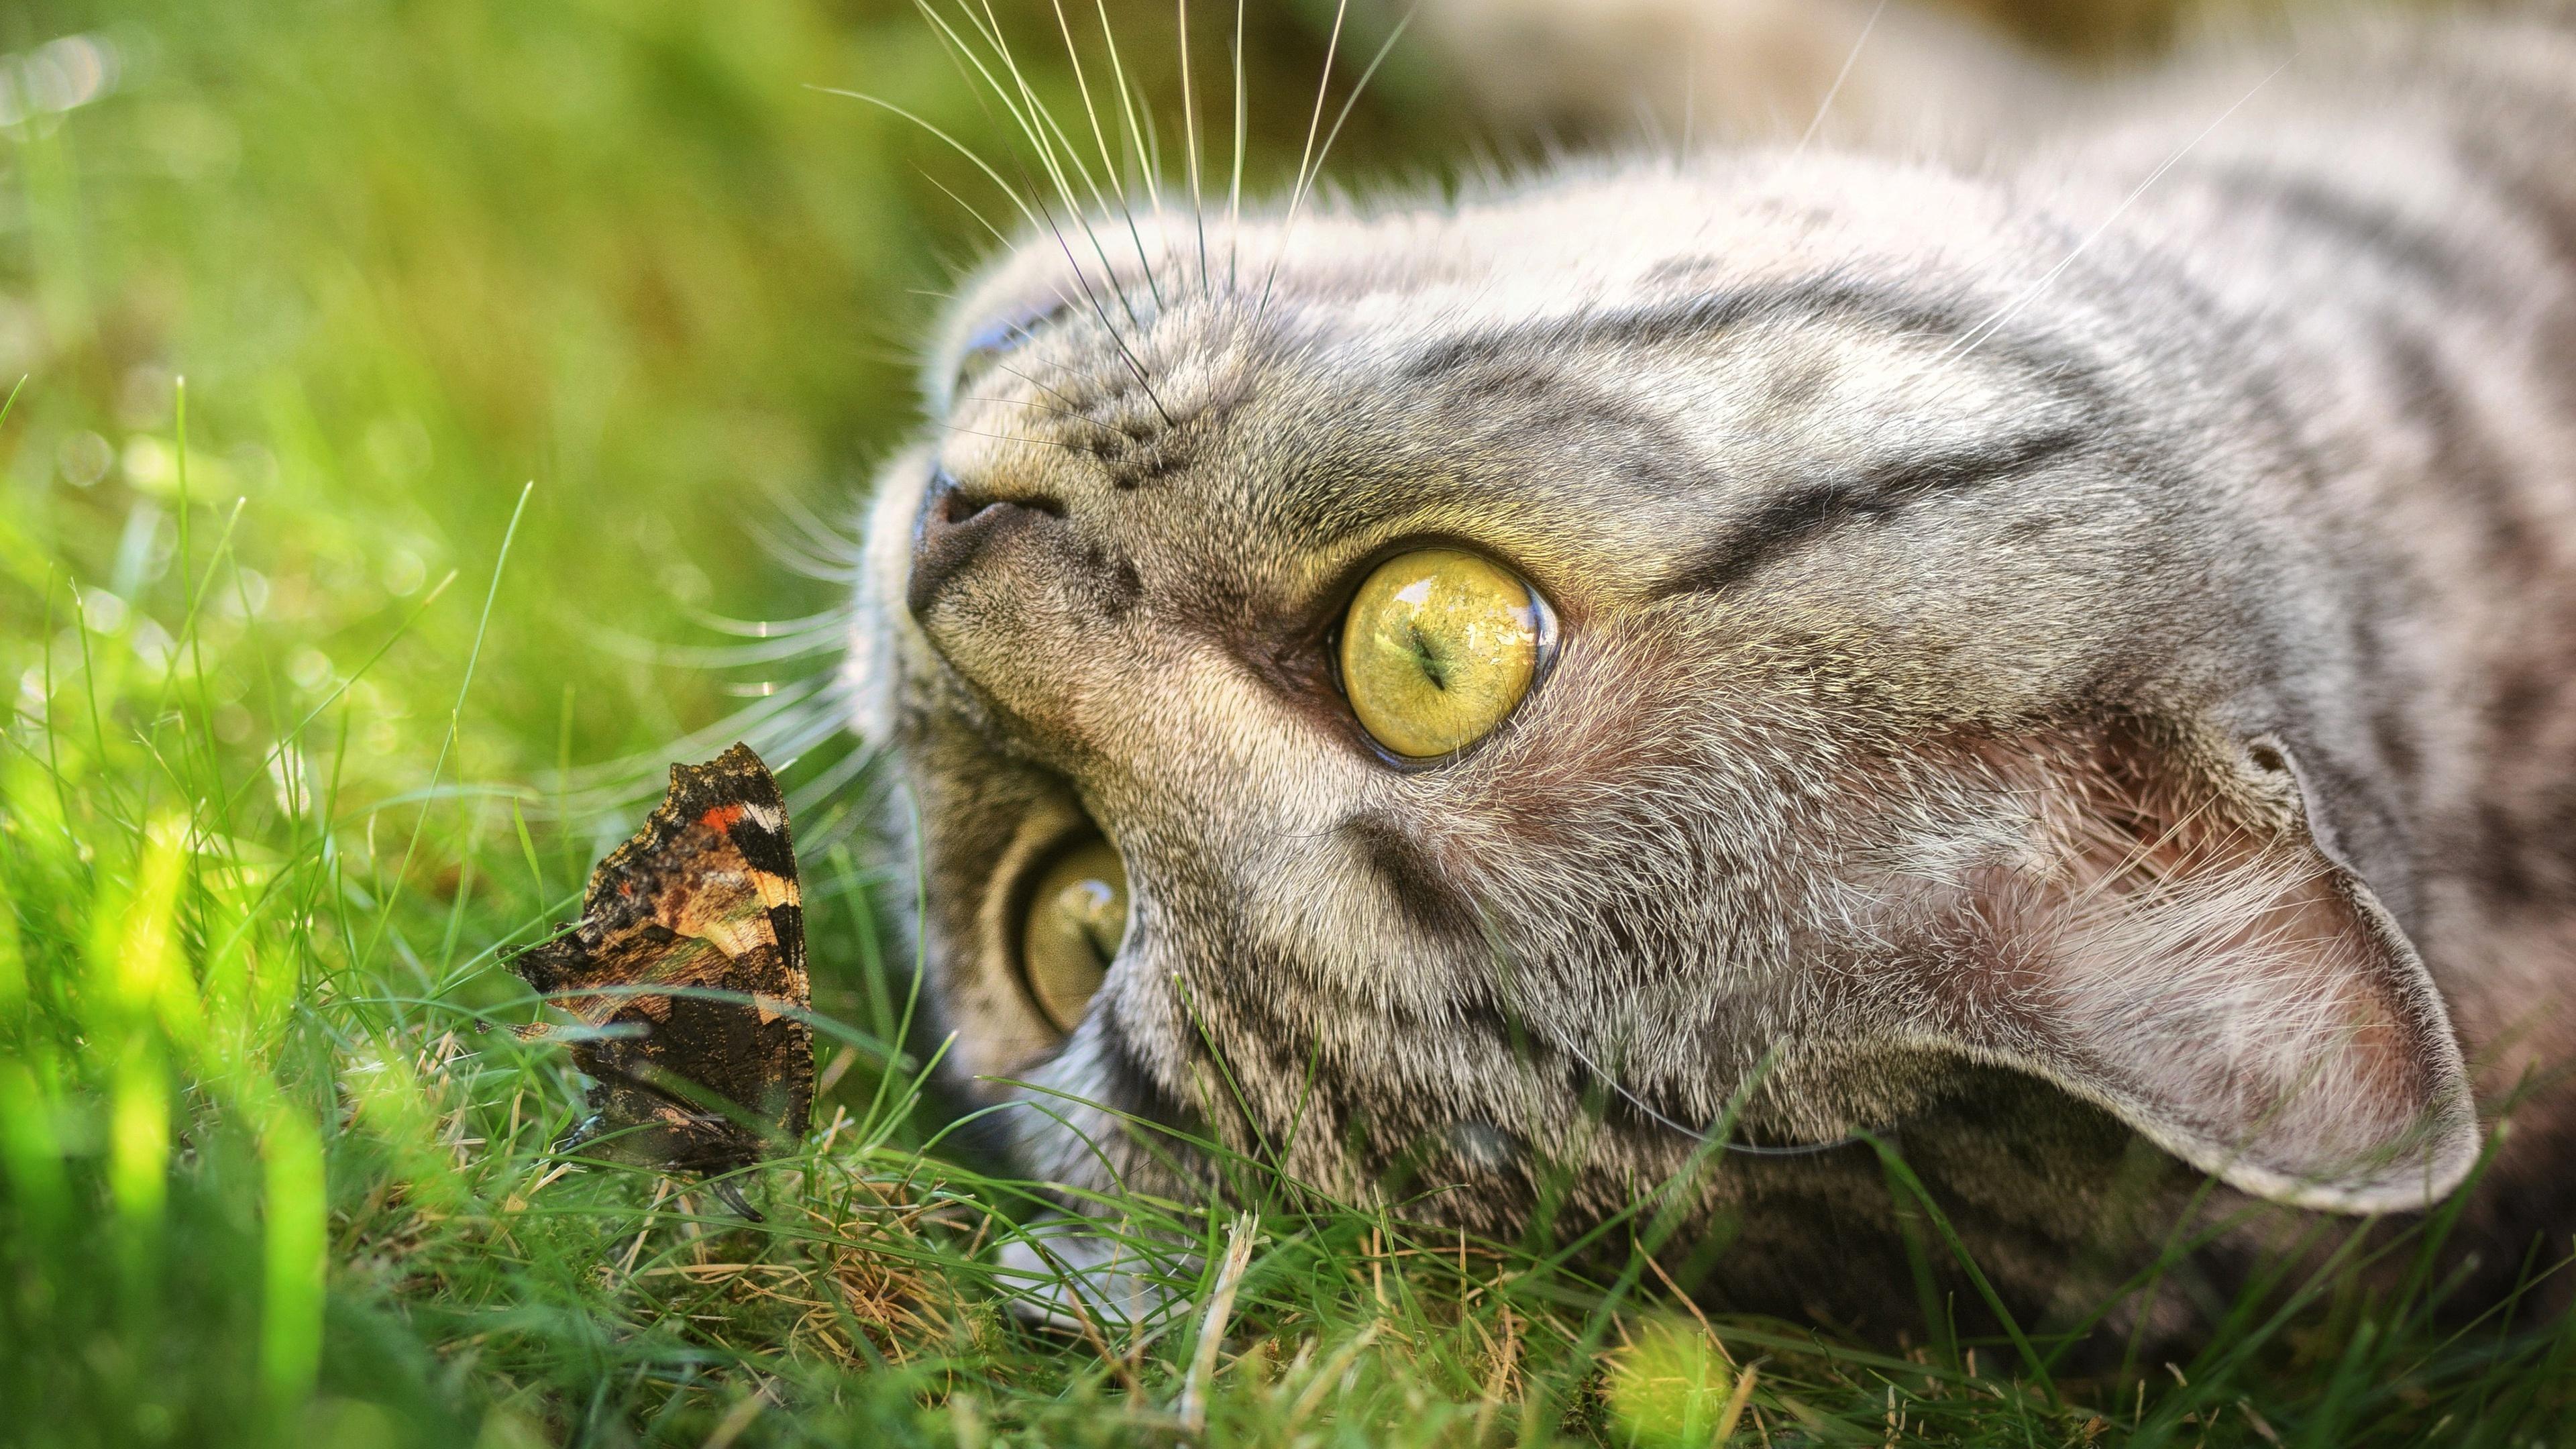 Картинка: Кошка, серая, трава, морда, бабочка